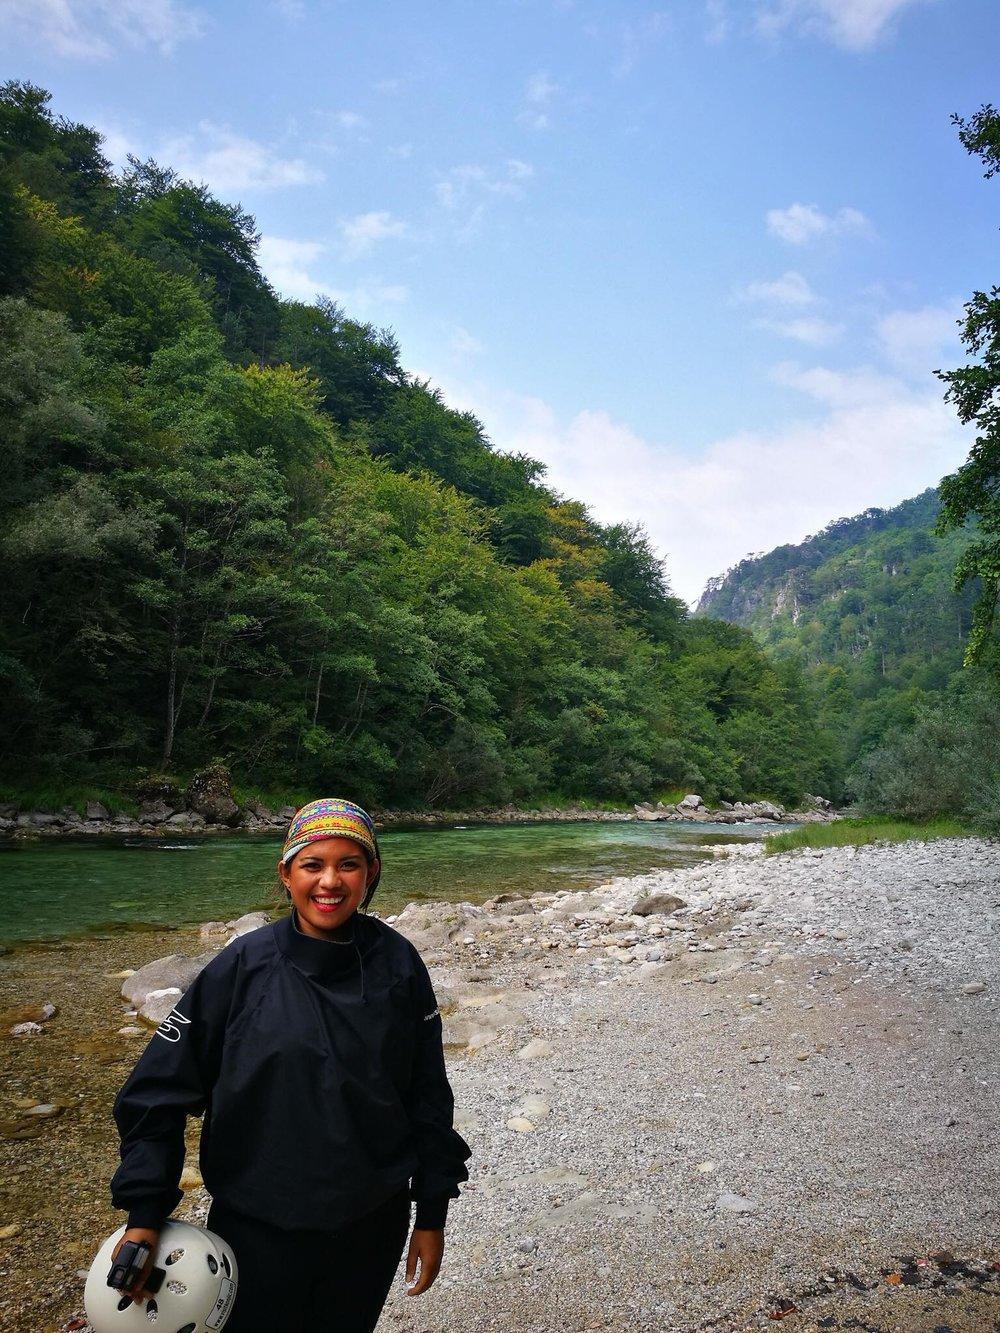 Kach Solo Travels Day 13: Water Rafting in Neretva River in Konjic, Bosnia & Herzegovina ❤️